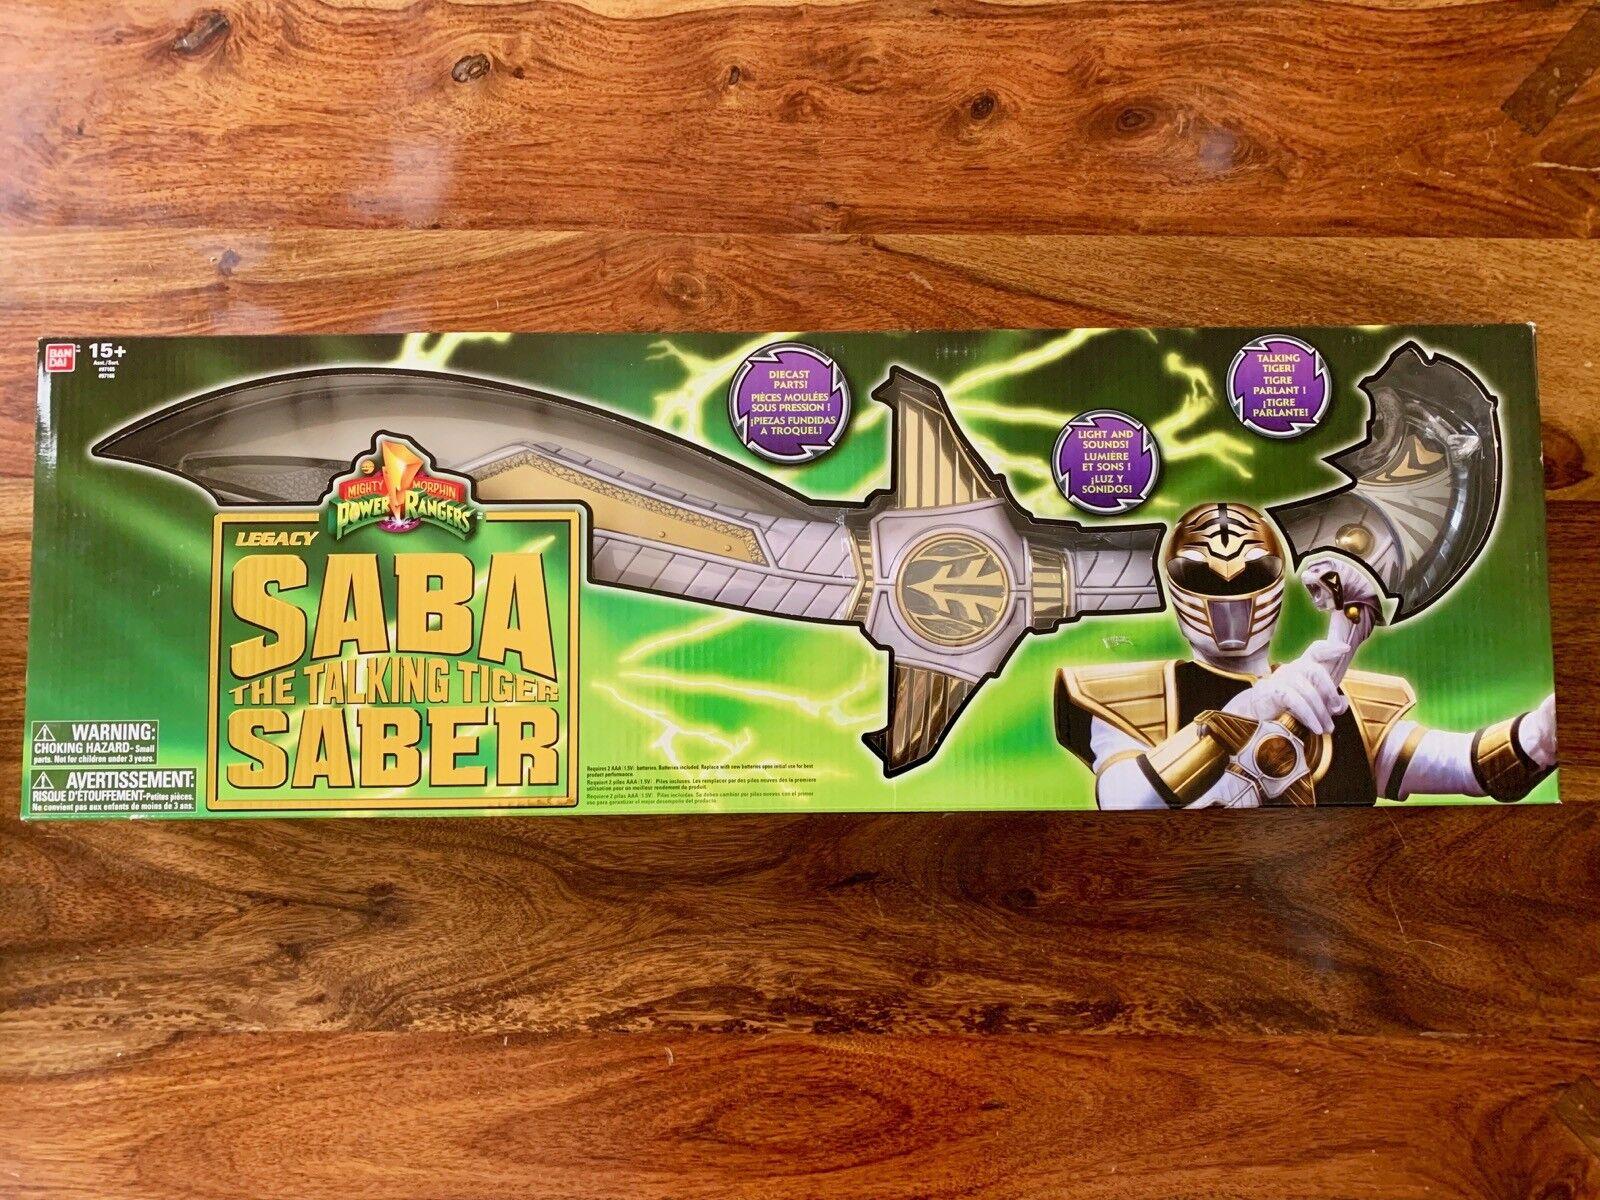 BRAND nuovo Power Rangers Legacy Saba Sword collectible collectible collectible replica 47b7fa